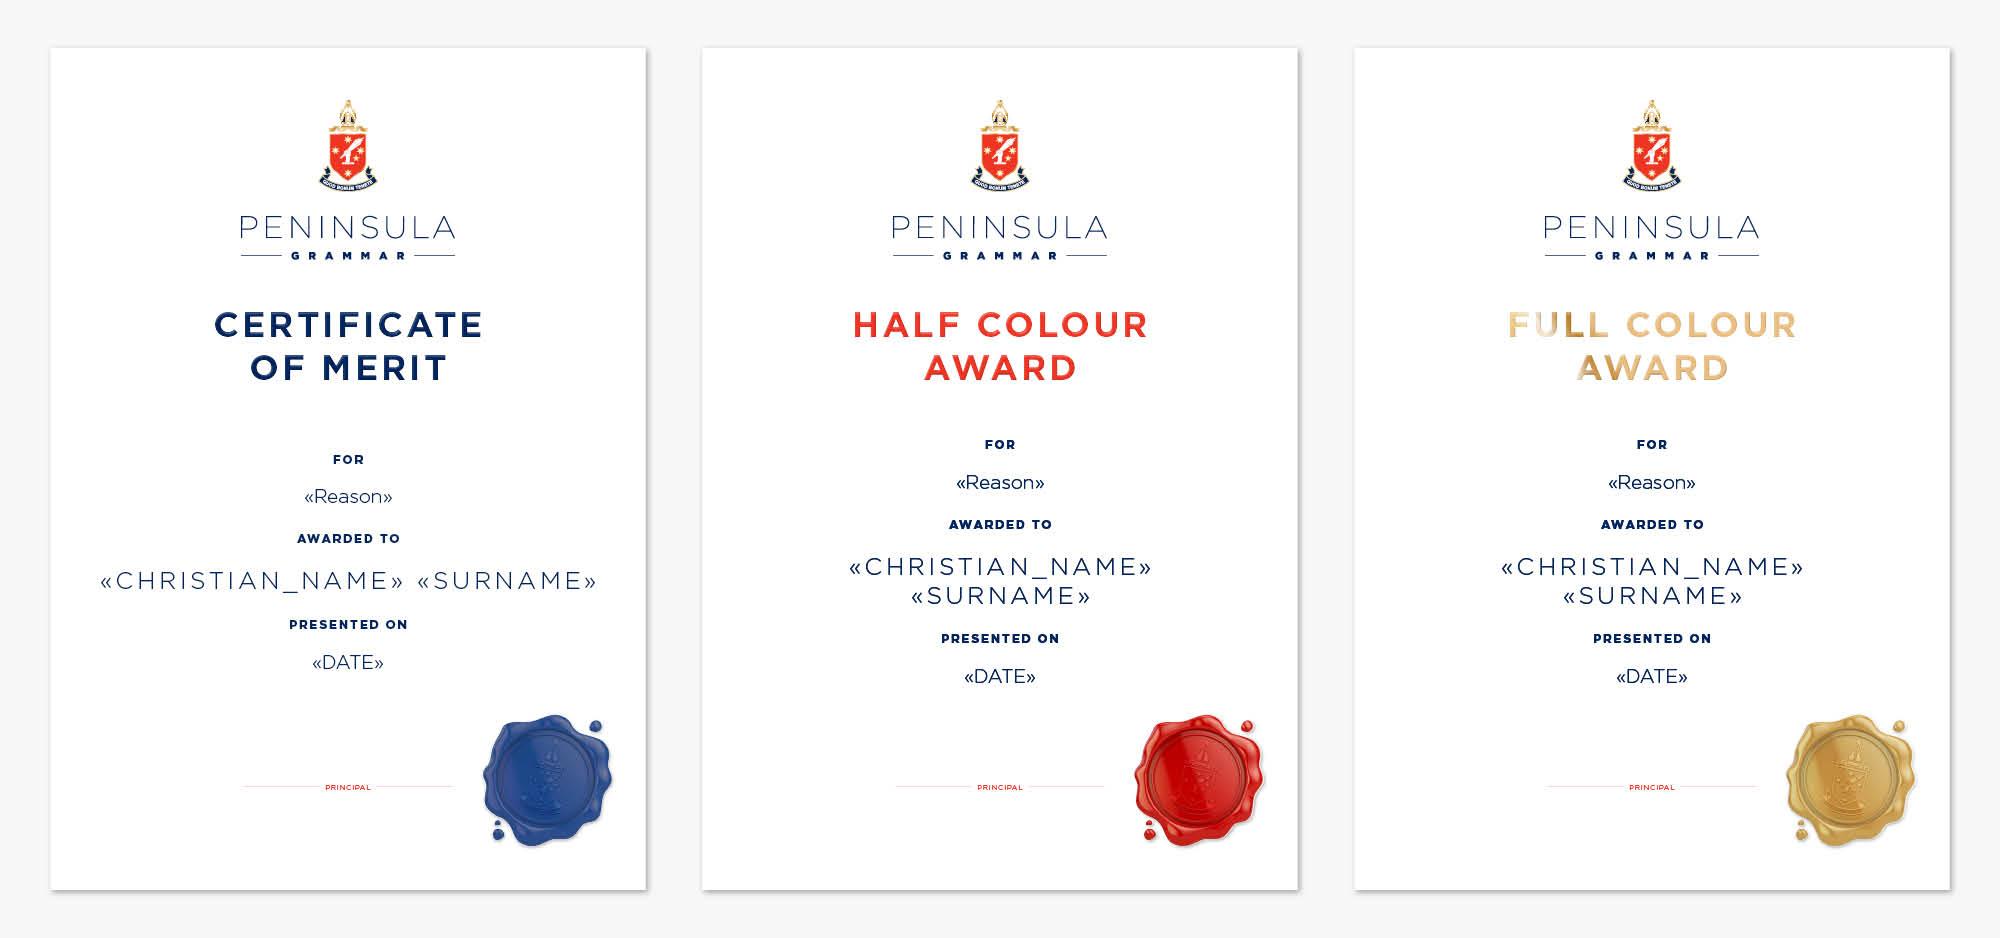 Graphic Design Work for Peninsula Grammar